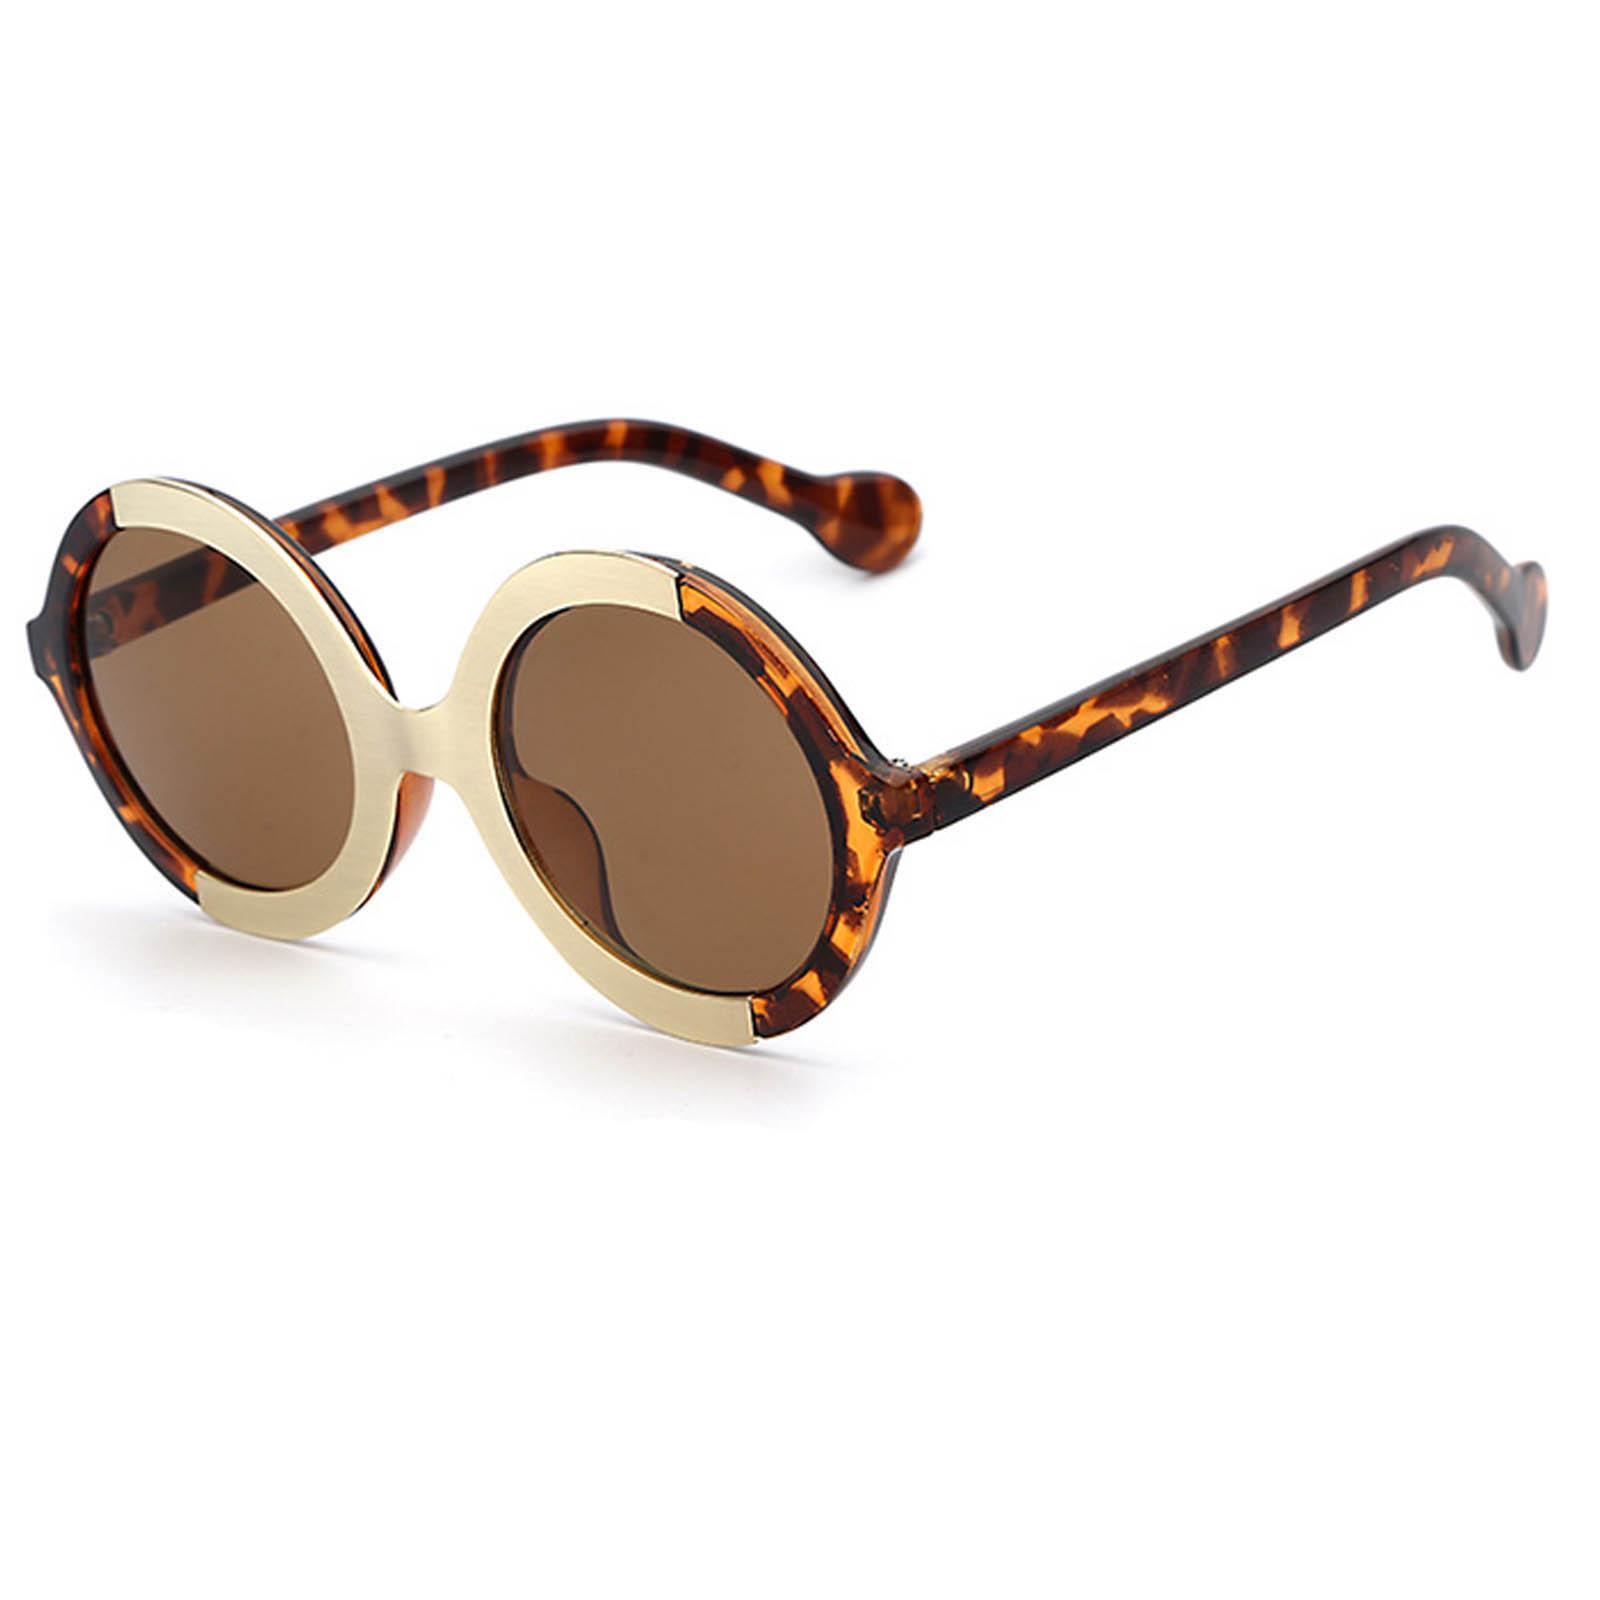 OWL ® 051 C2 Round Eyewear Sunglasses Women's Men's Plastic Round Circle Leopard Frame Brown Lens One Pair